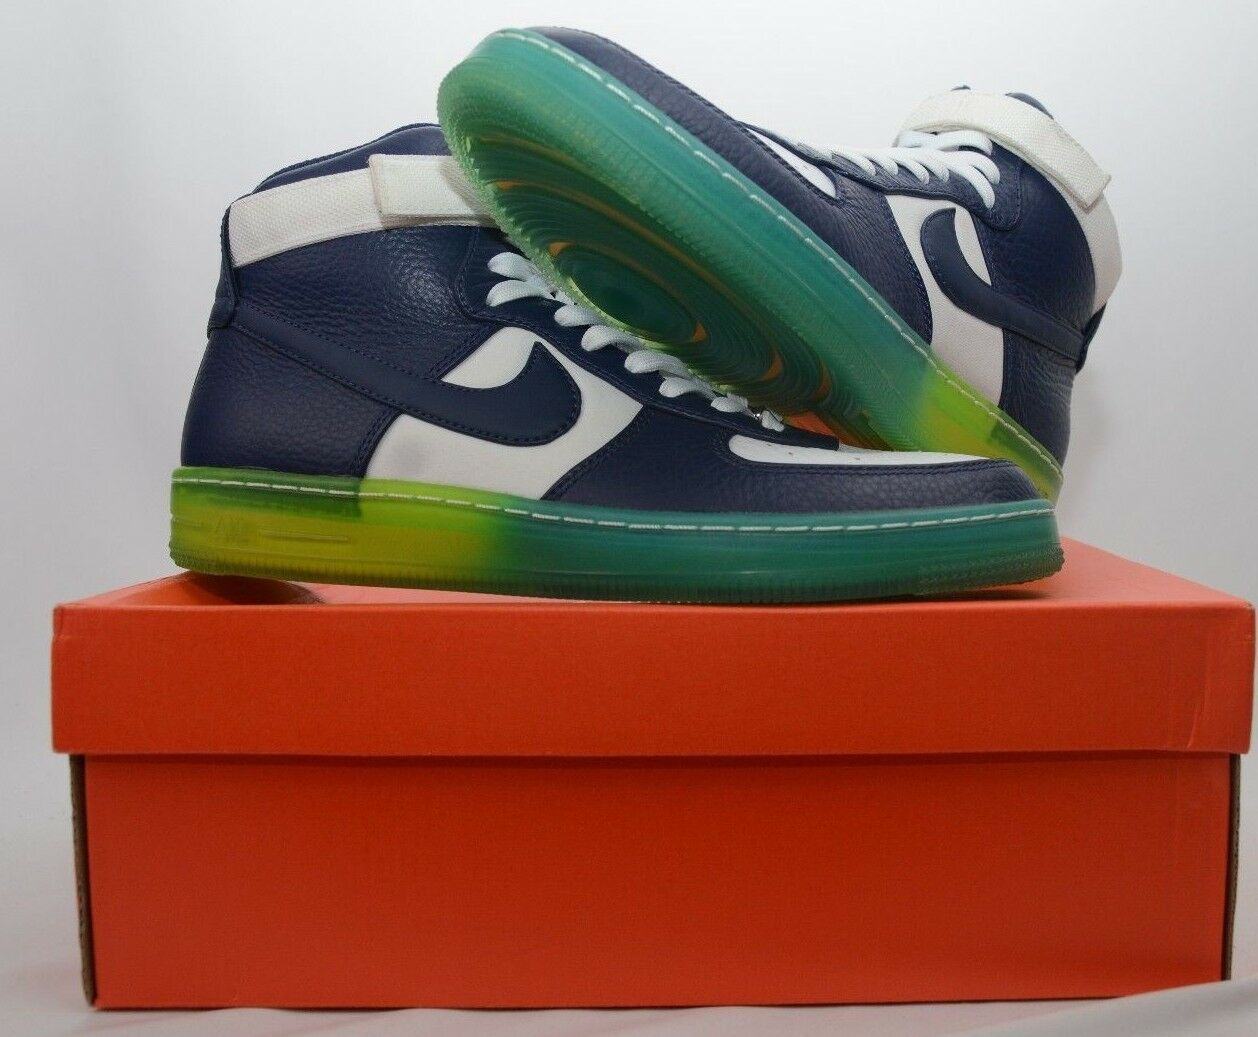 Nike air force 1 in hohen brise marine    marine 9 new in box 649572 400 08a7f1